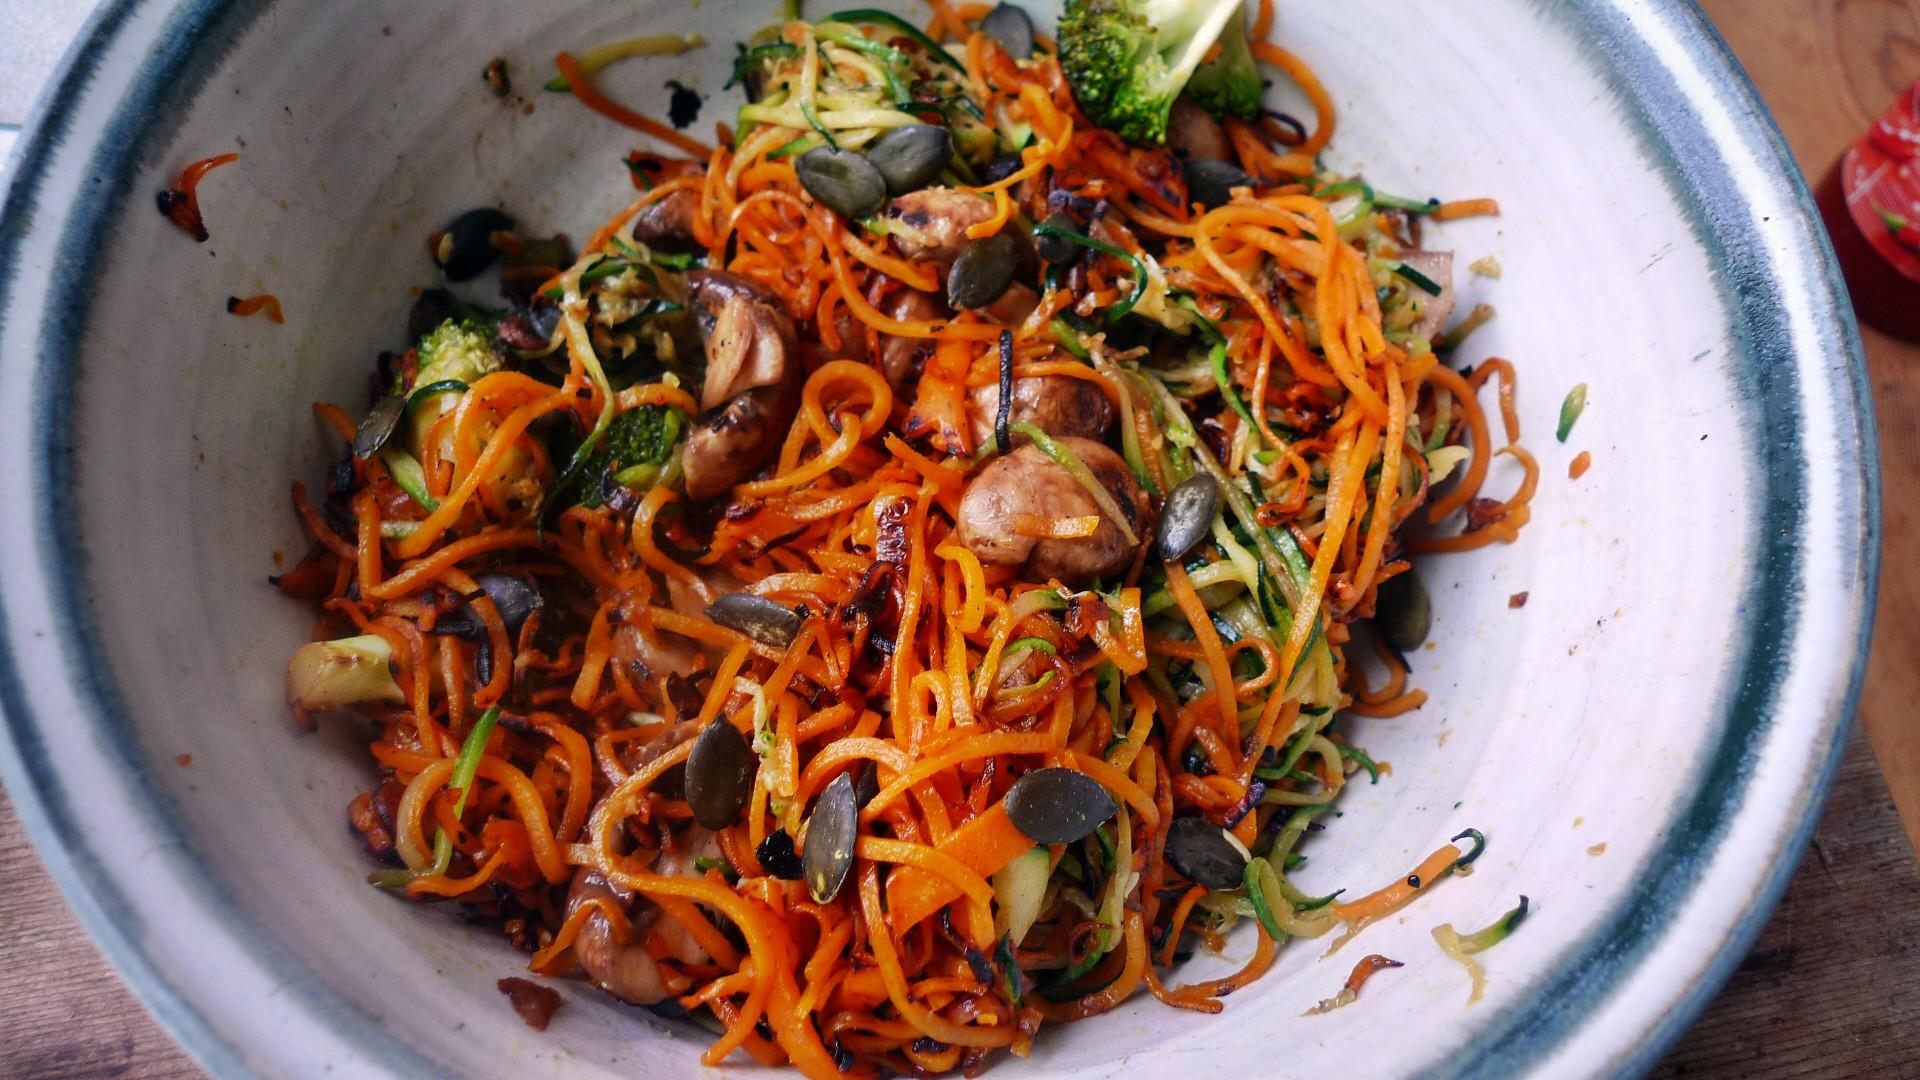 Gemüsespaghetti mit Champignon,Kohlrabisalat,Tomatensalat,vegan -5.5.15   (11)